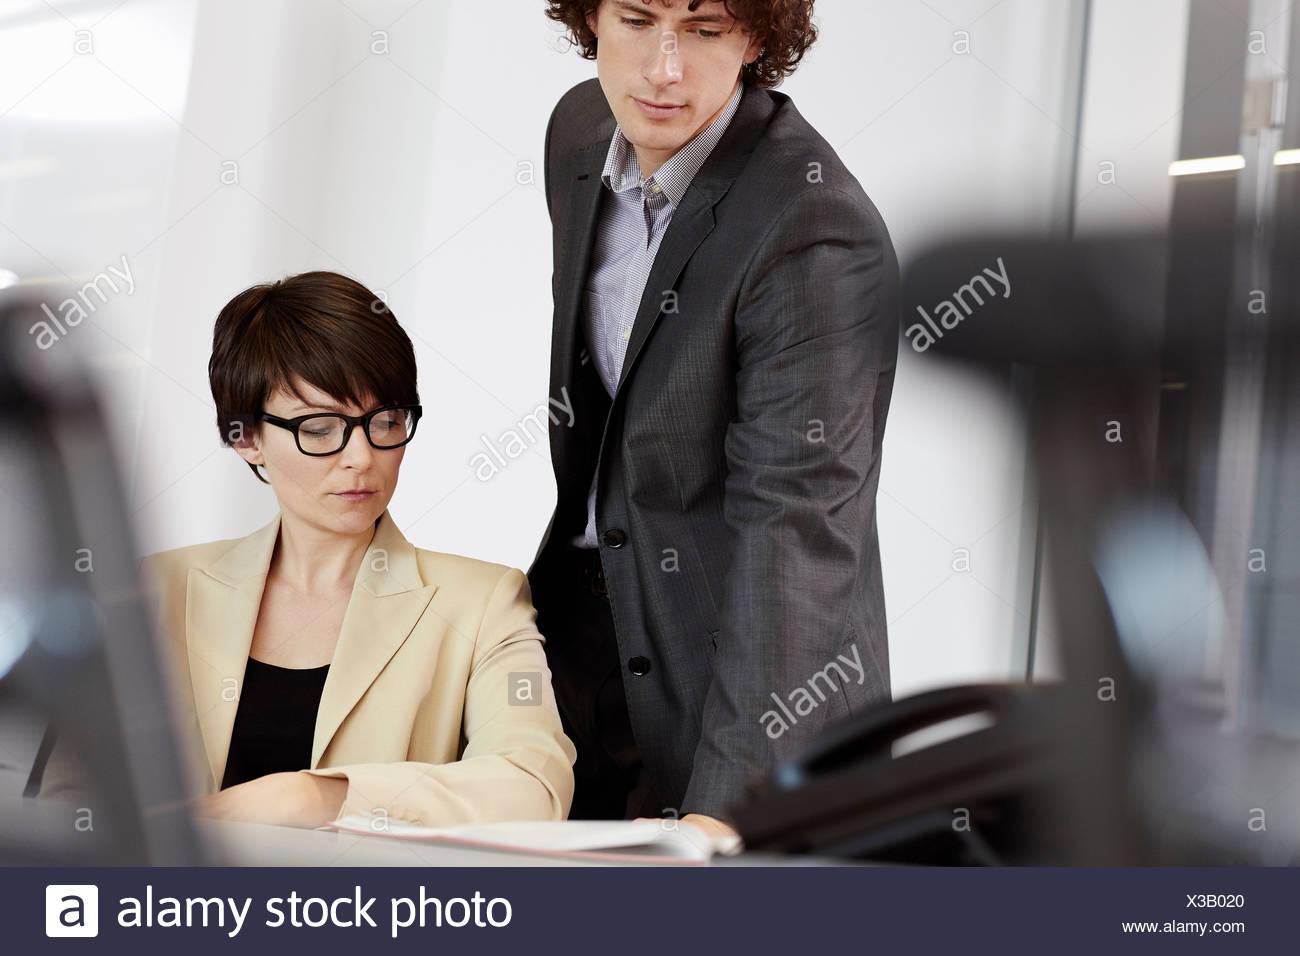 Businesswoman sitting at desk, man looking over her shoulder at paperwork - Stock Image